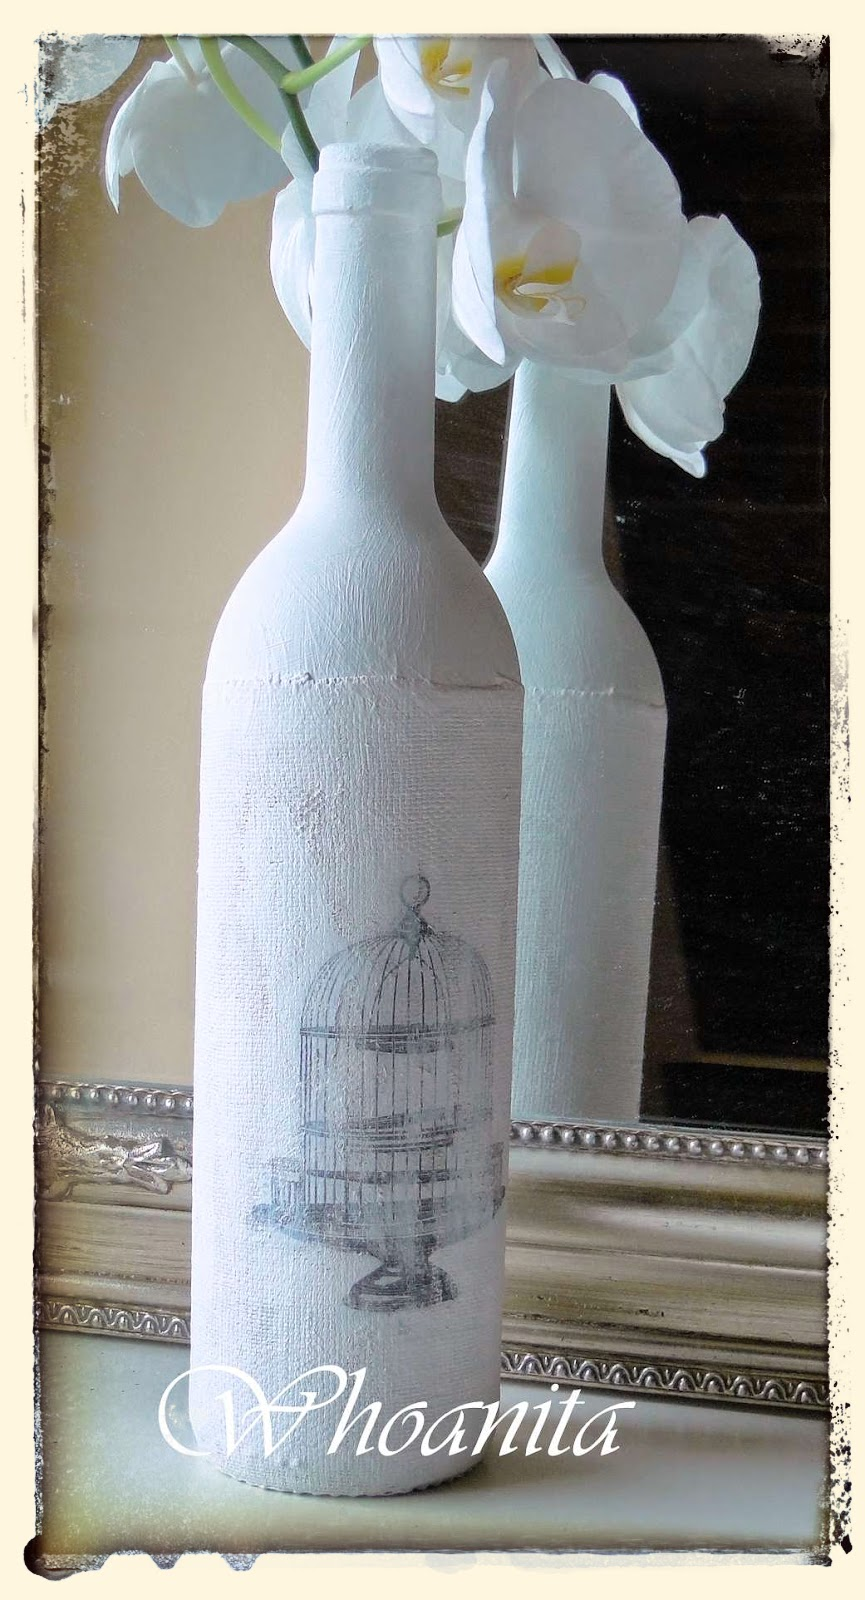 butelka w bieli, transfer